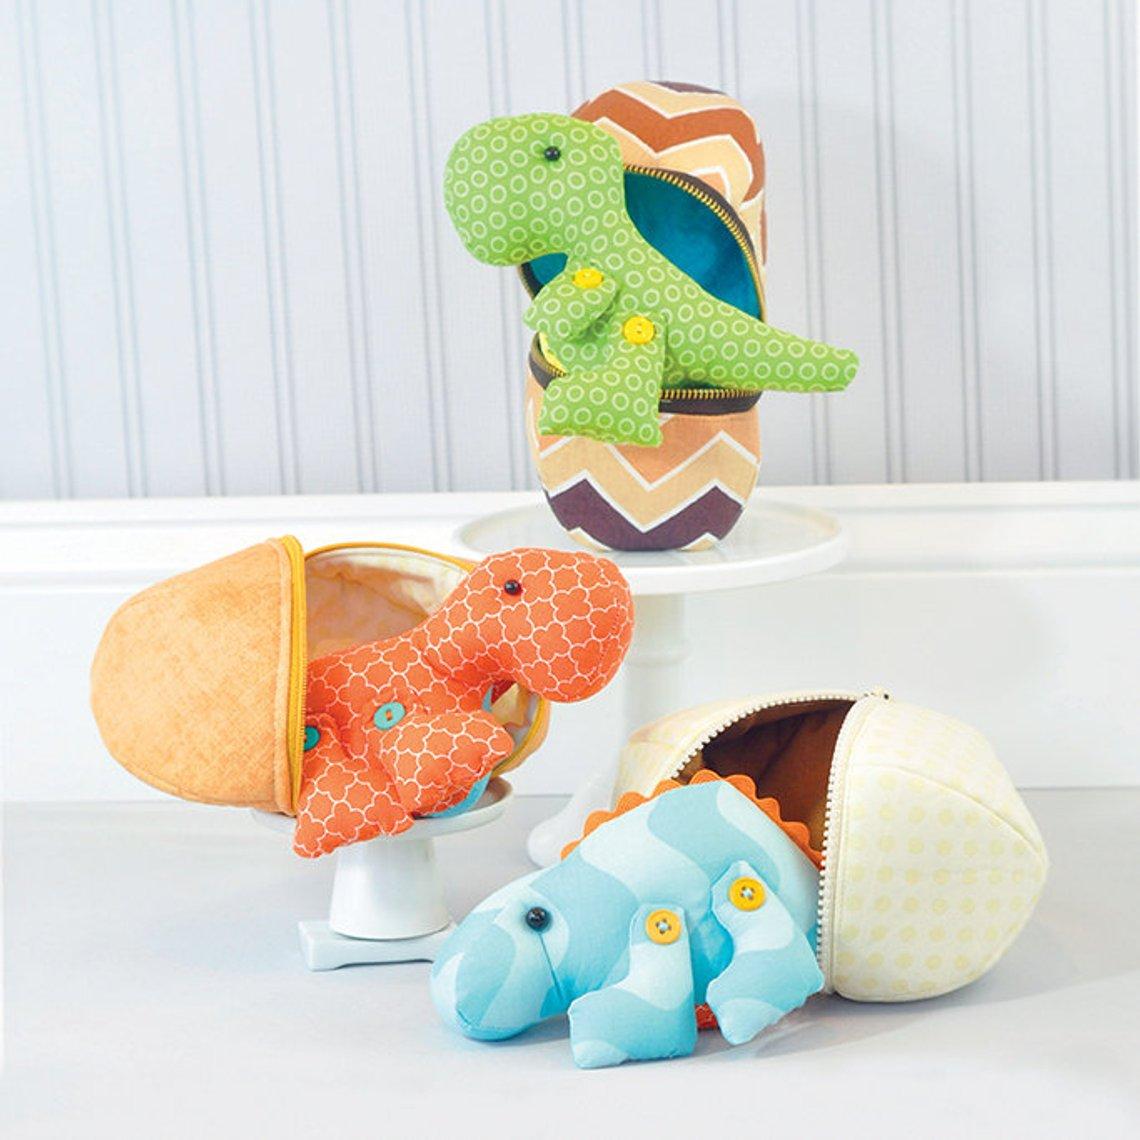 stuffed dinosaur toy to sew